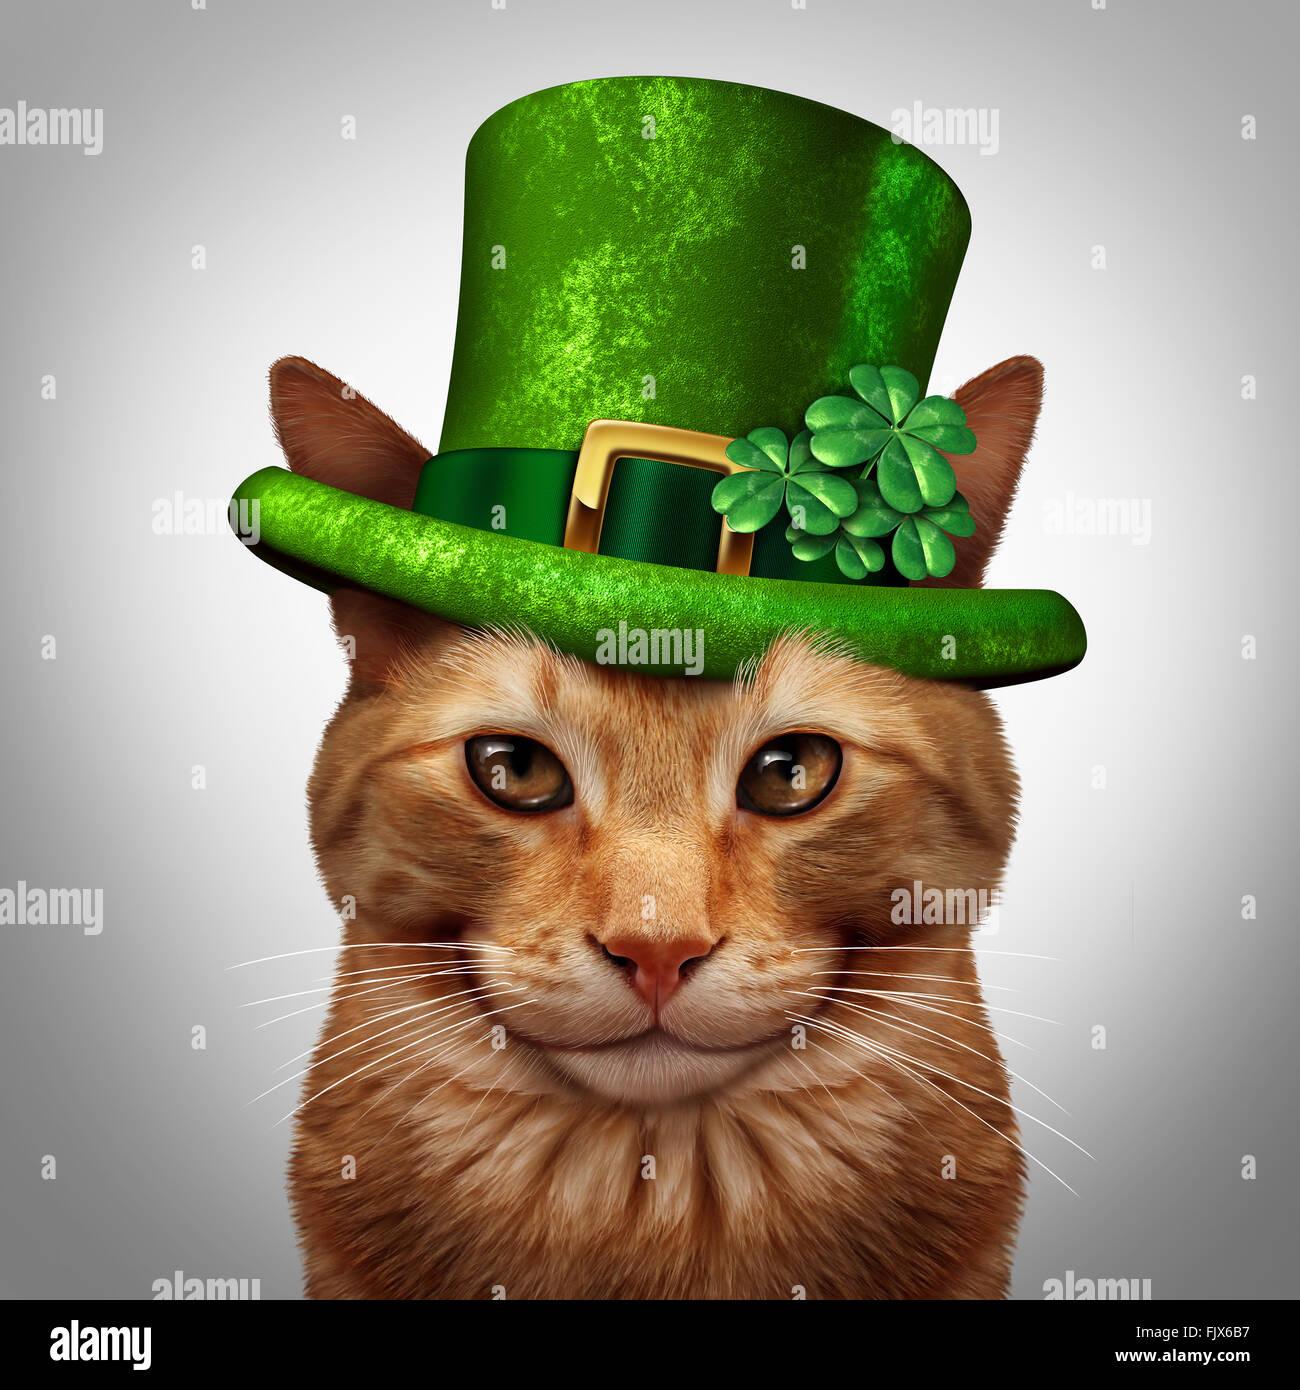 Día de San Patricio como un divertido concepto gato feliz sonriente mascota felina leprechuan vistiendo un Imagen De Stock